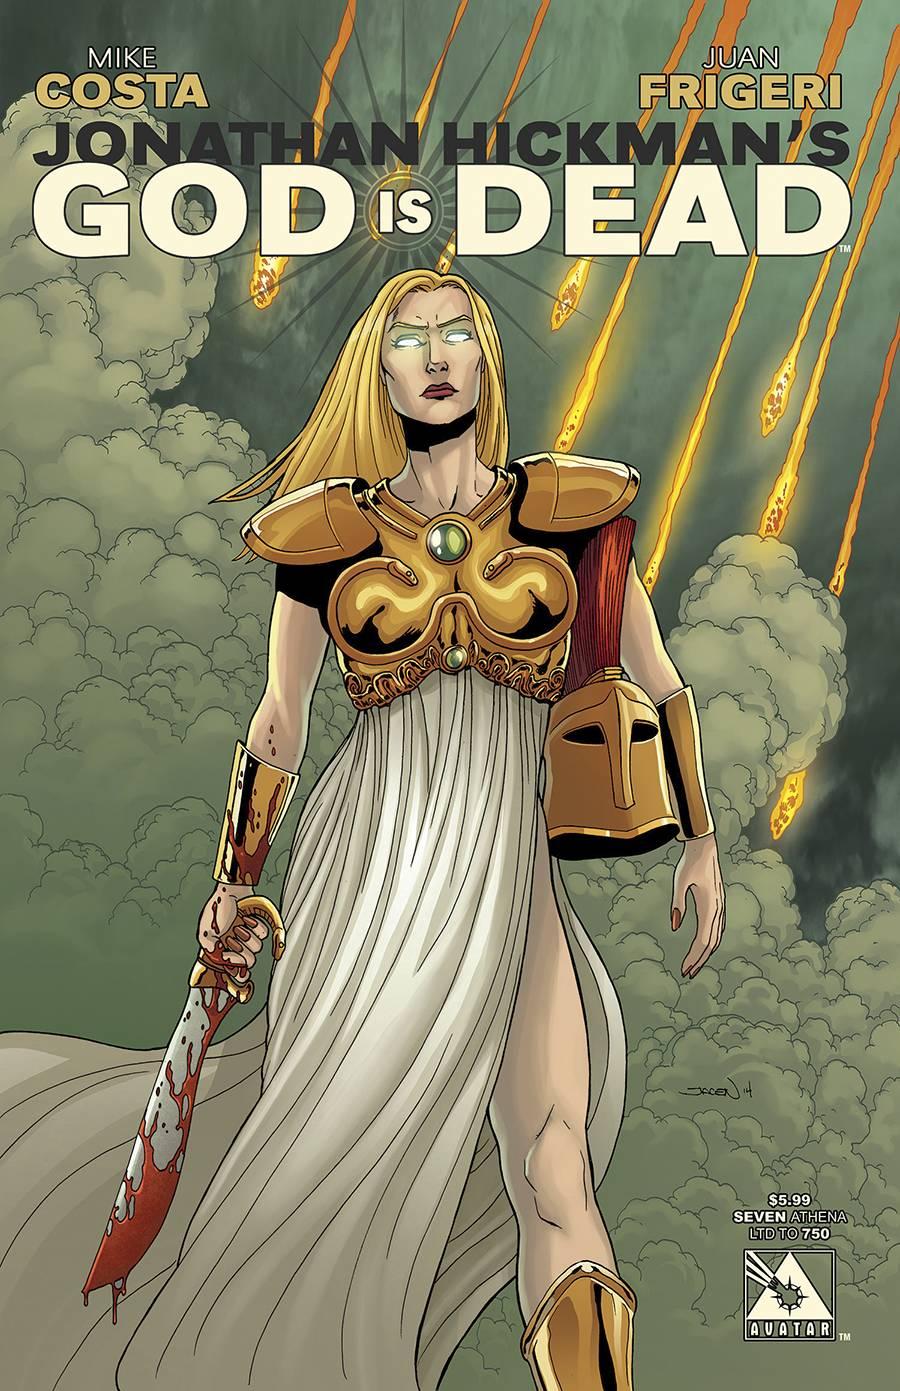 Mature comics marvel